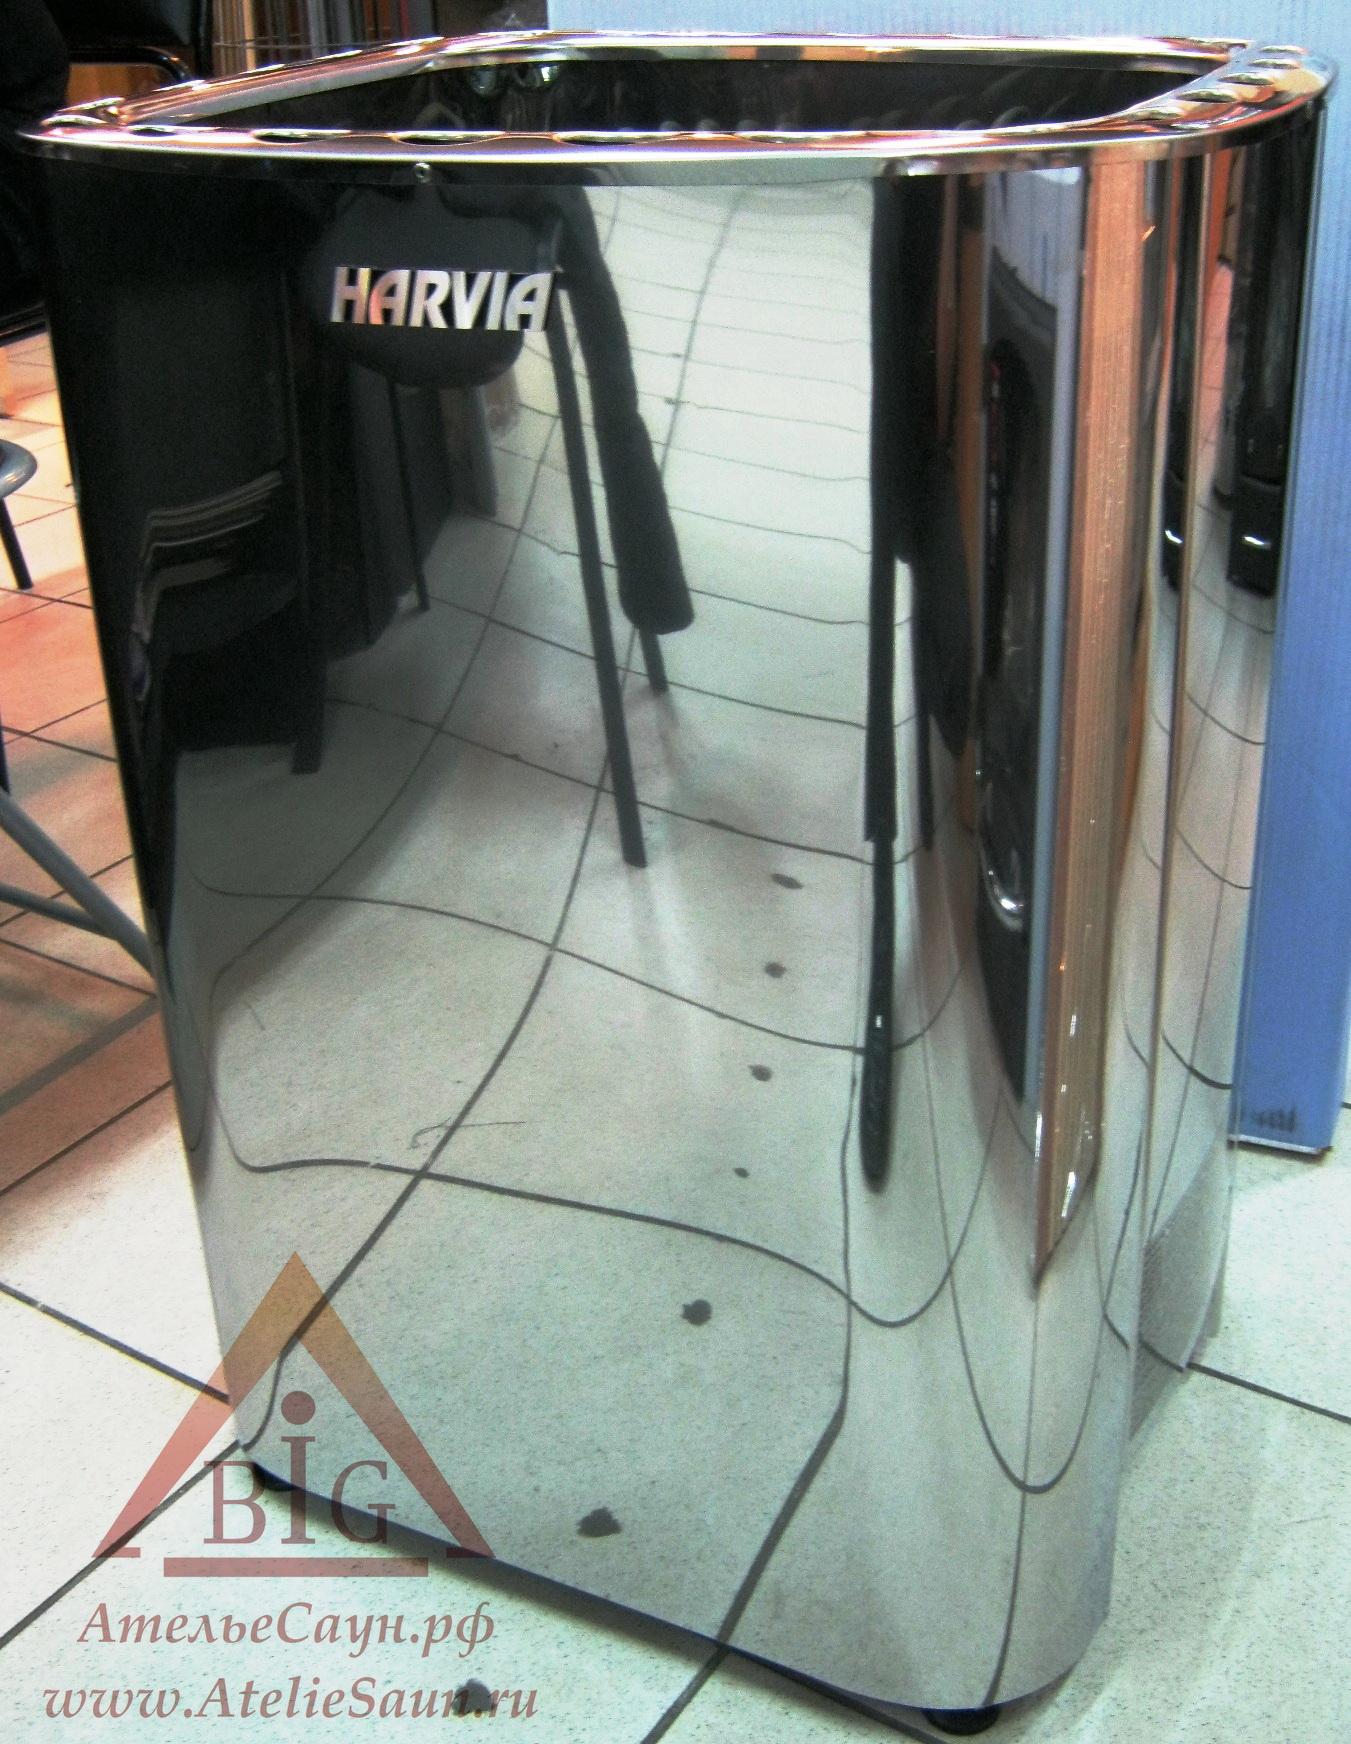 Электрокаменка Harvia Club K 11 G (без пульта)